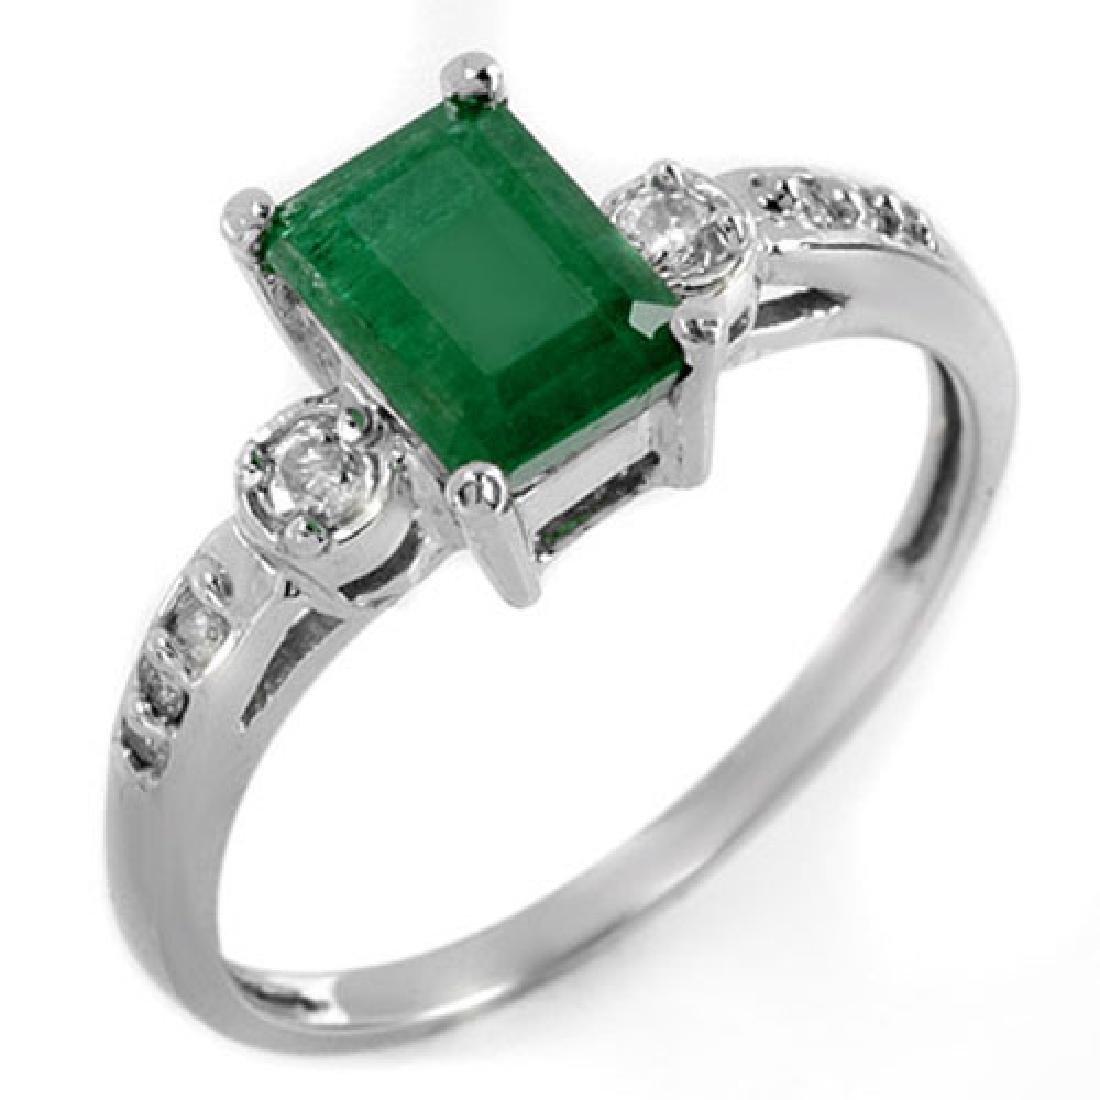 1.45 CTW Emerald & Diamond Ring 10K White Gold